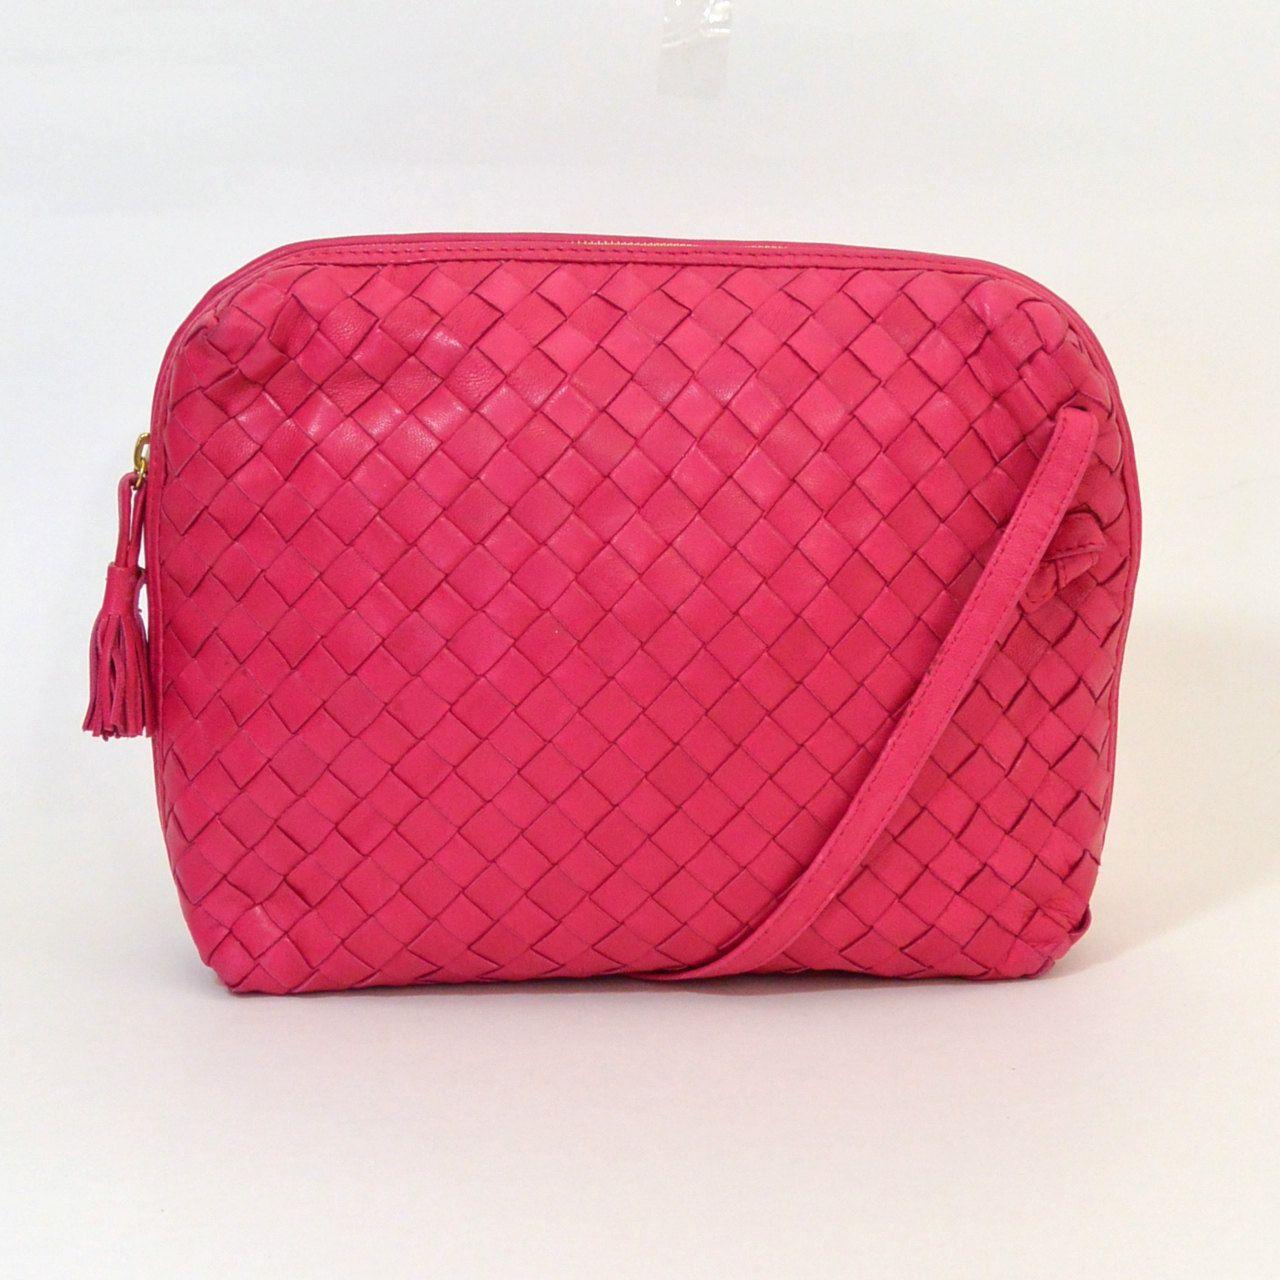 Vintage 1980s 1990s Bottega Veneta Intrecciato Nappa Messenger Pillow Bag Shoulder Purse Cross Body Woven Leather Pink